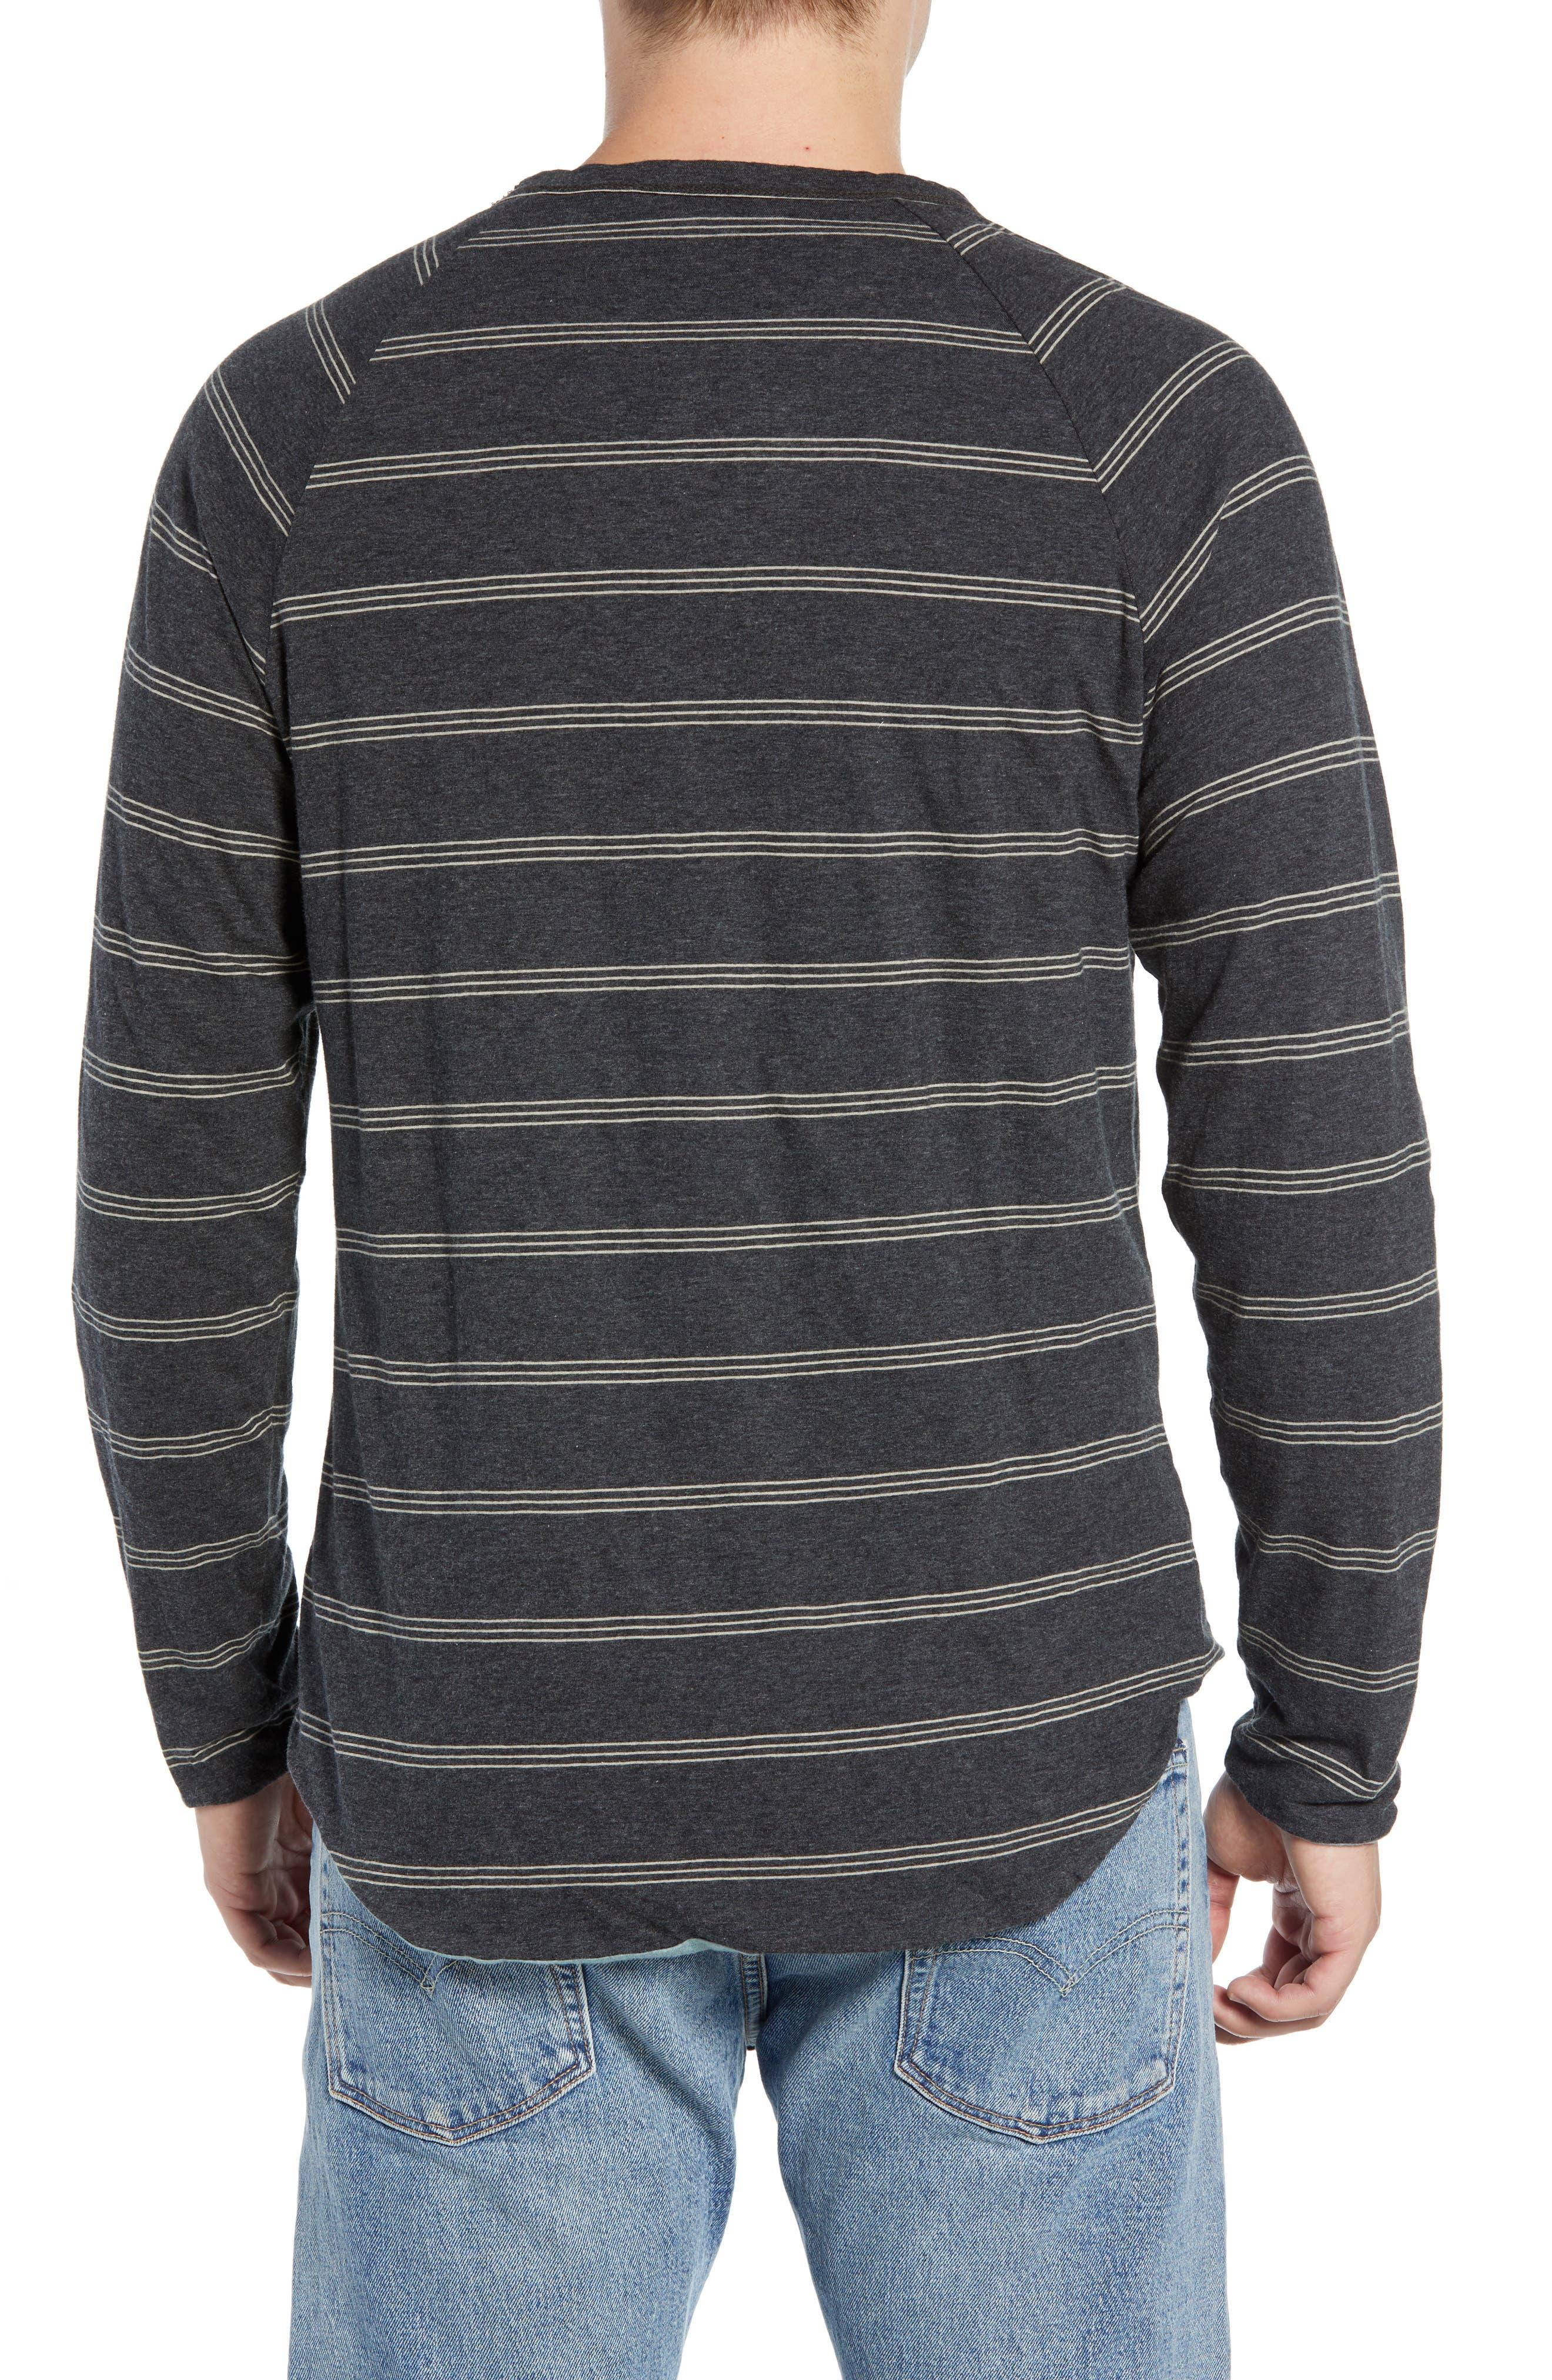 Gunnison Reversible Raglan Sleeve T-Shirt,                             Alternate thumbnail 3, color,                             PHANTOM HEATHER